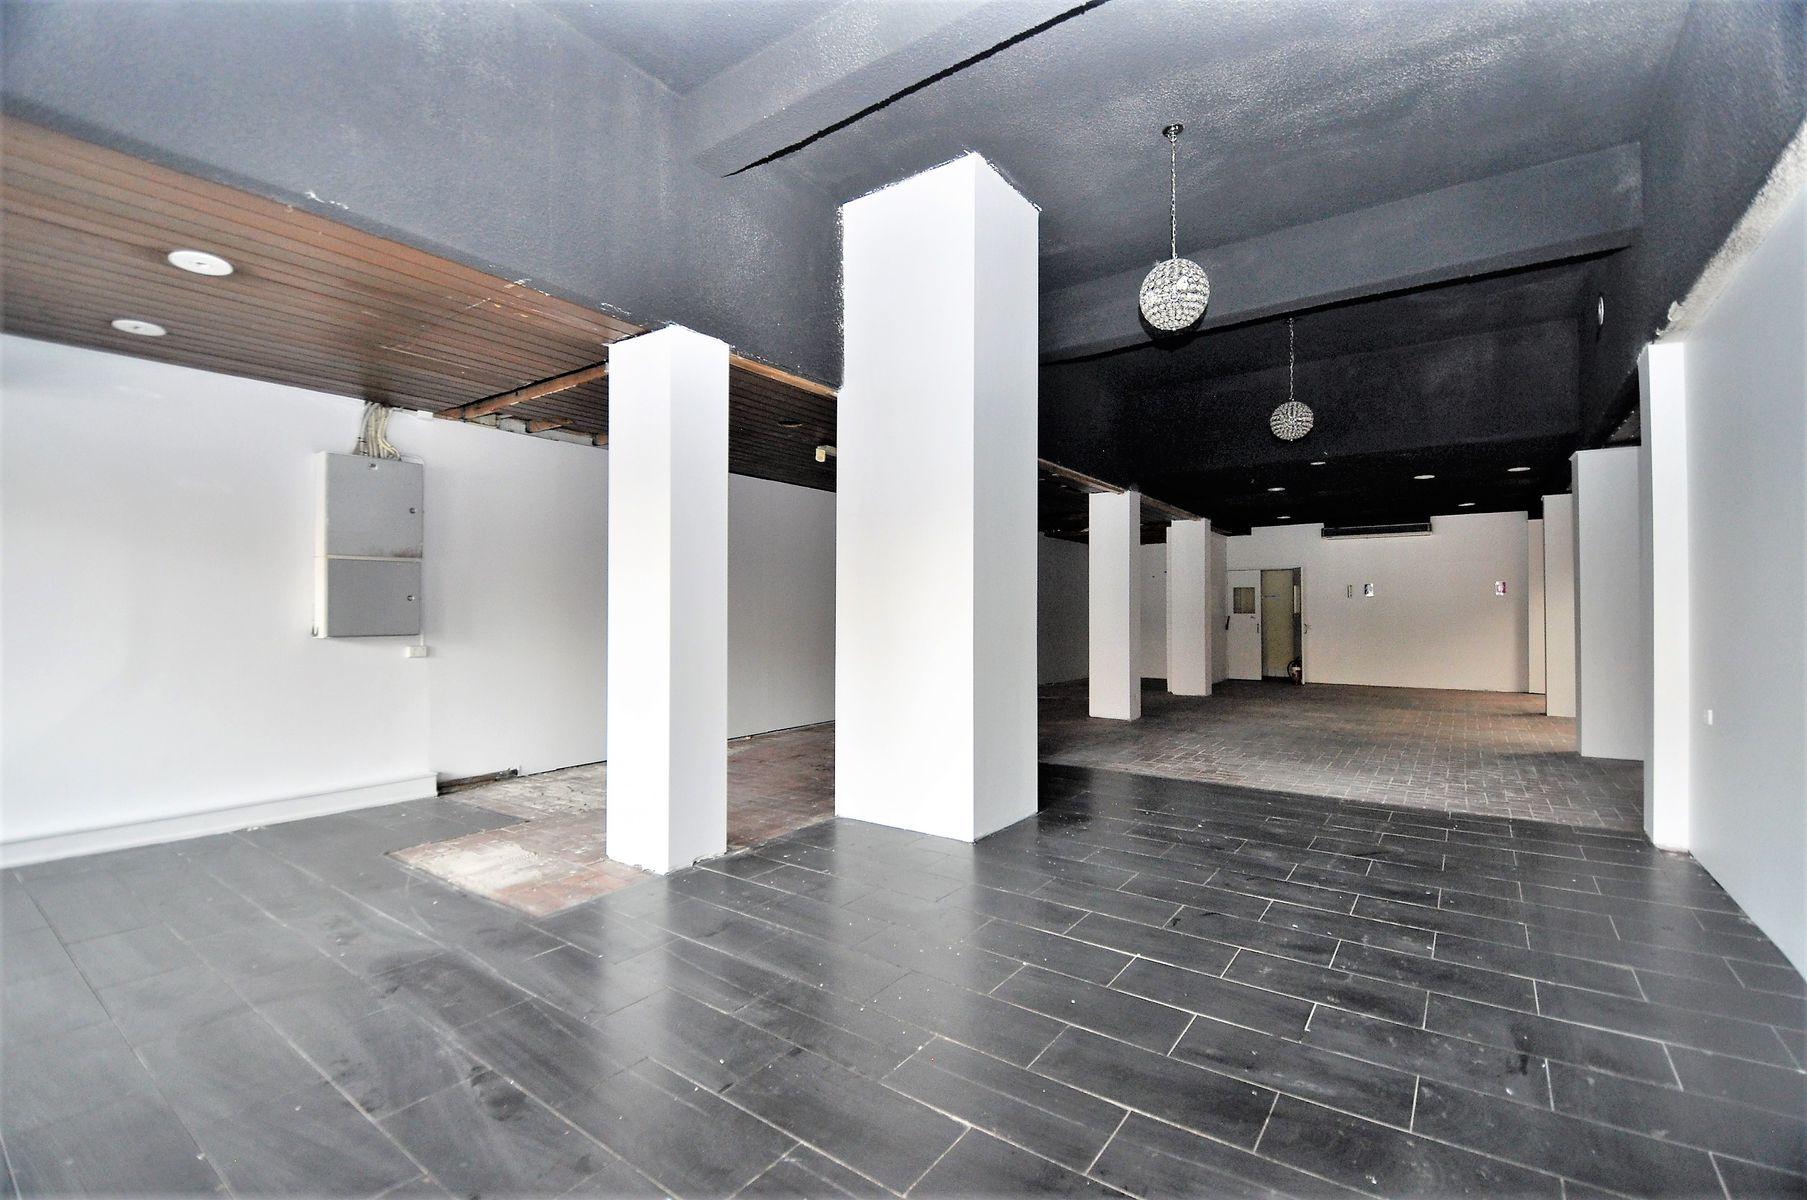 382 Hargreaves Street, Bendigo, VIC 3550